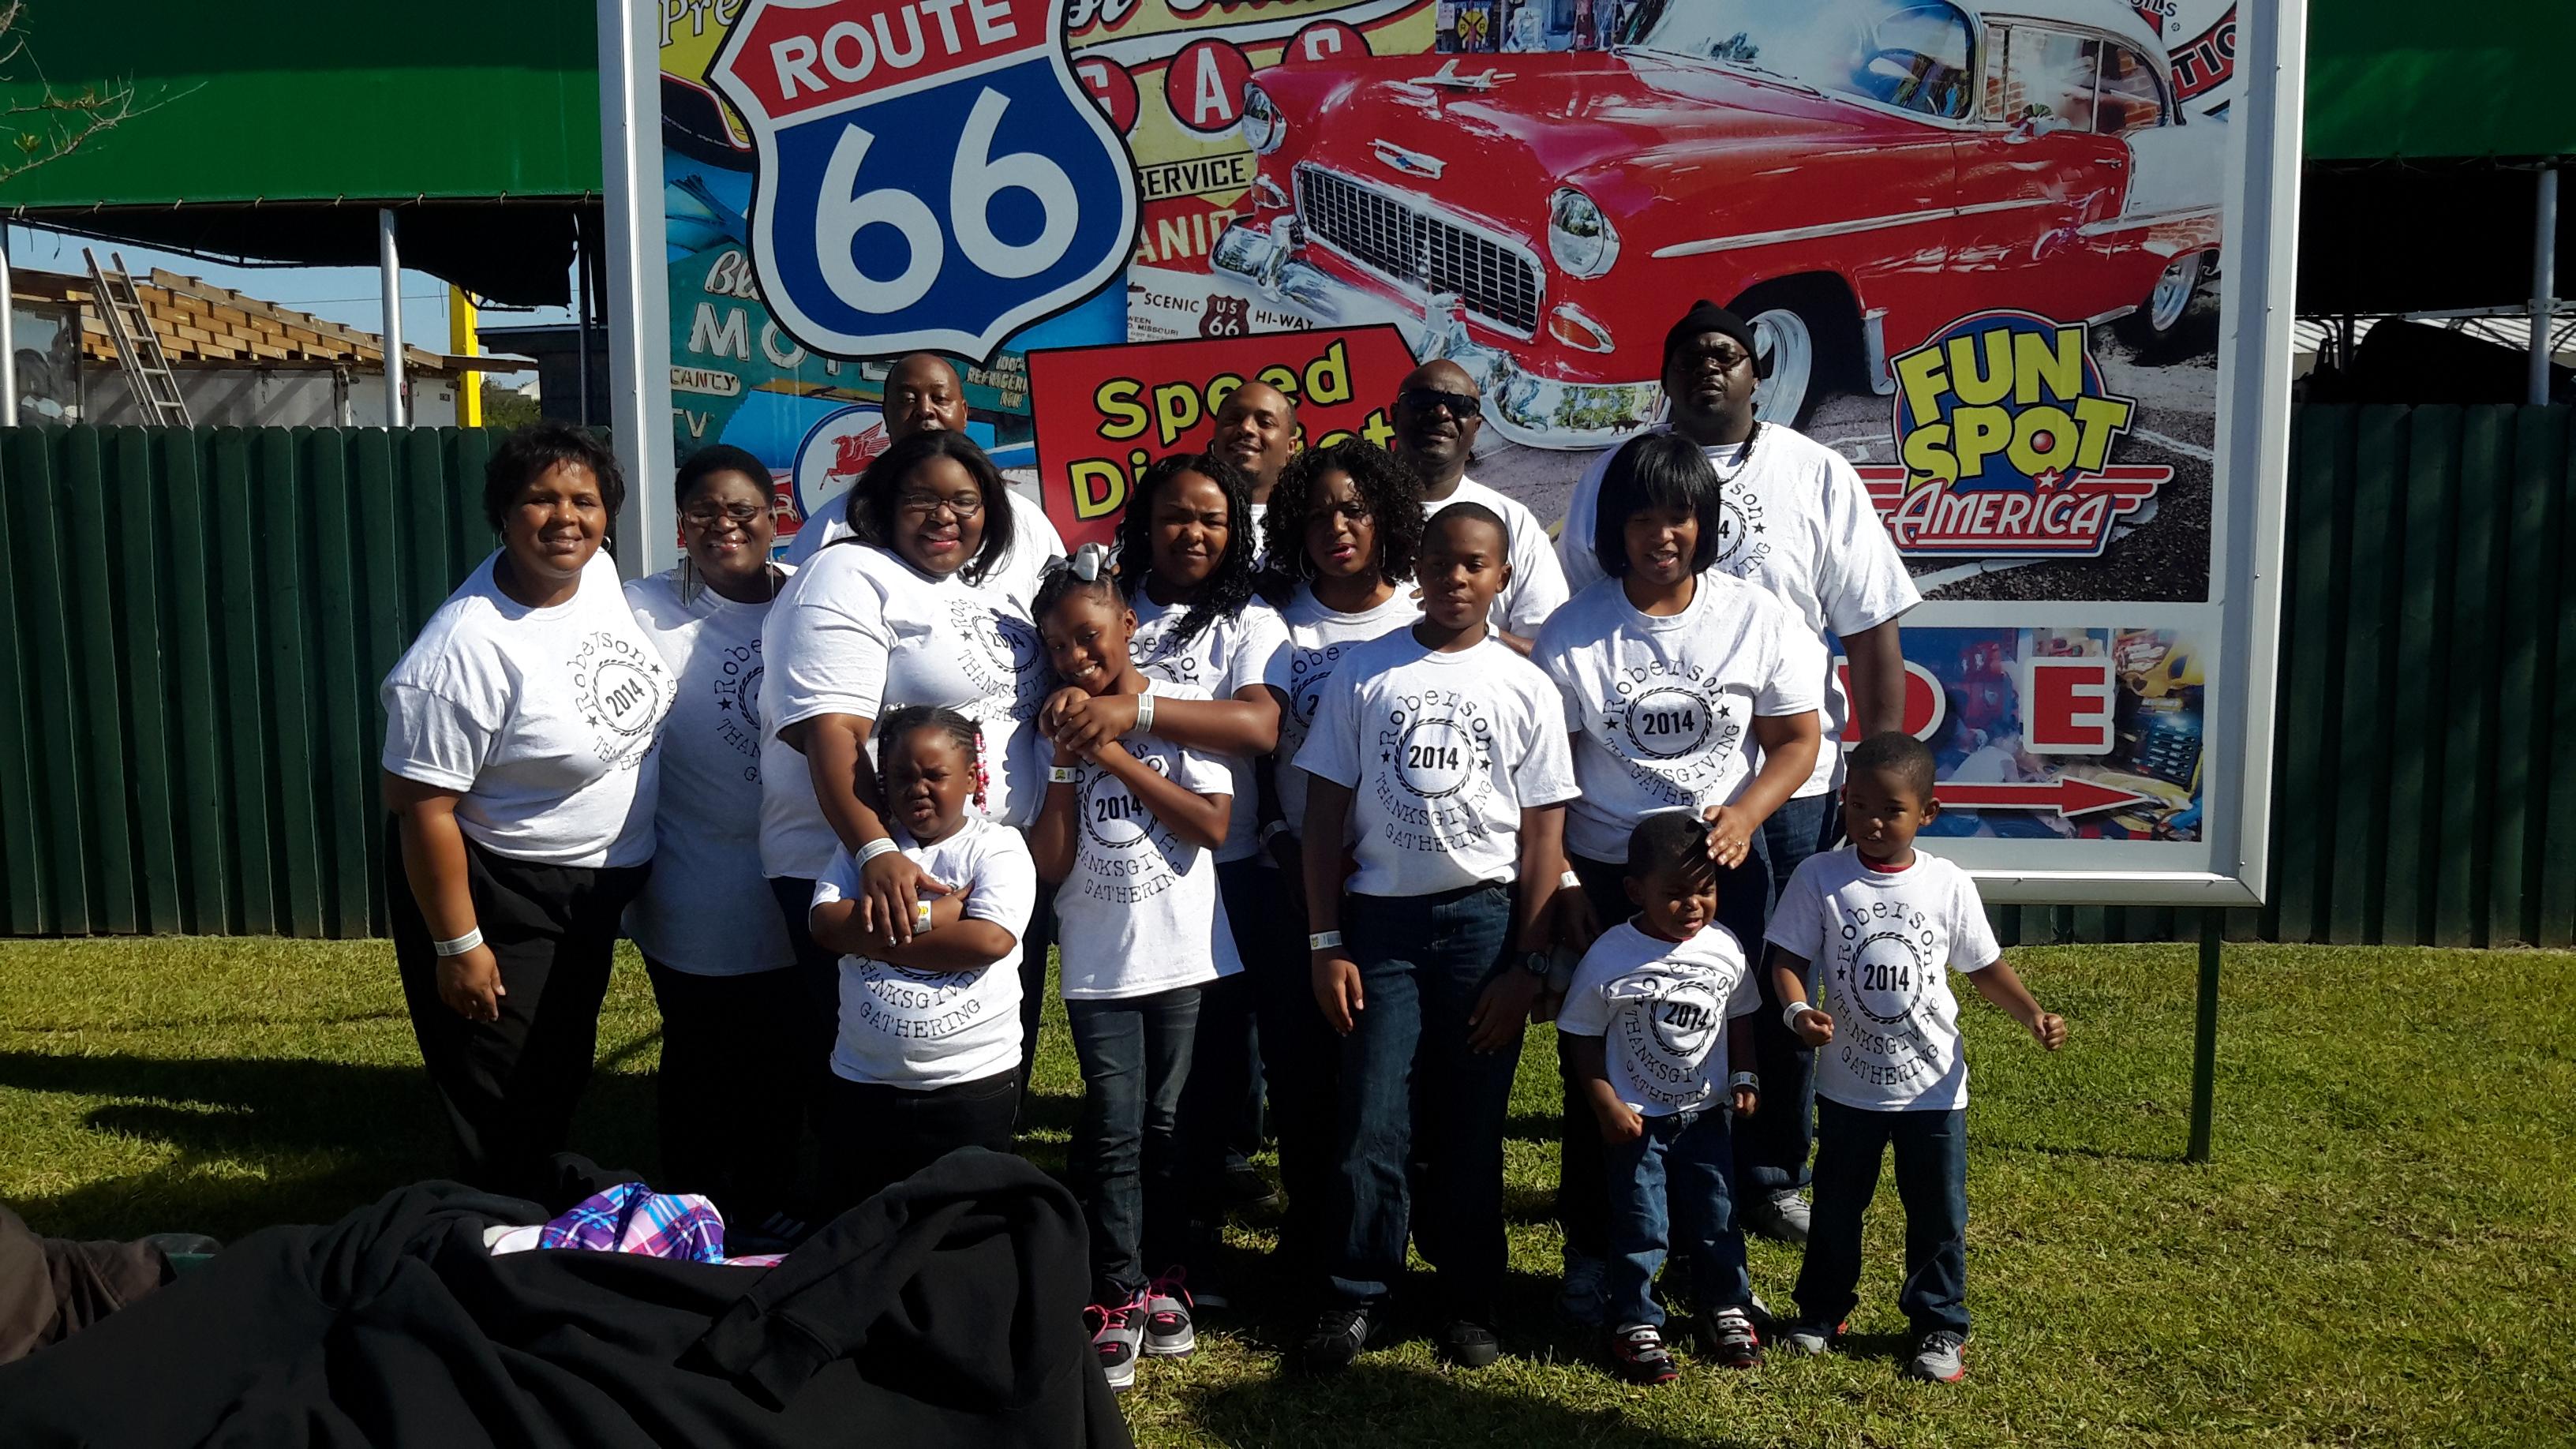 Design t shirt family gathering - Roberson Family Gathering T Shirt Photo